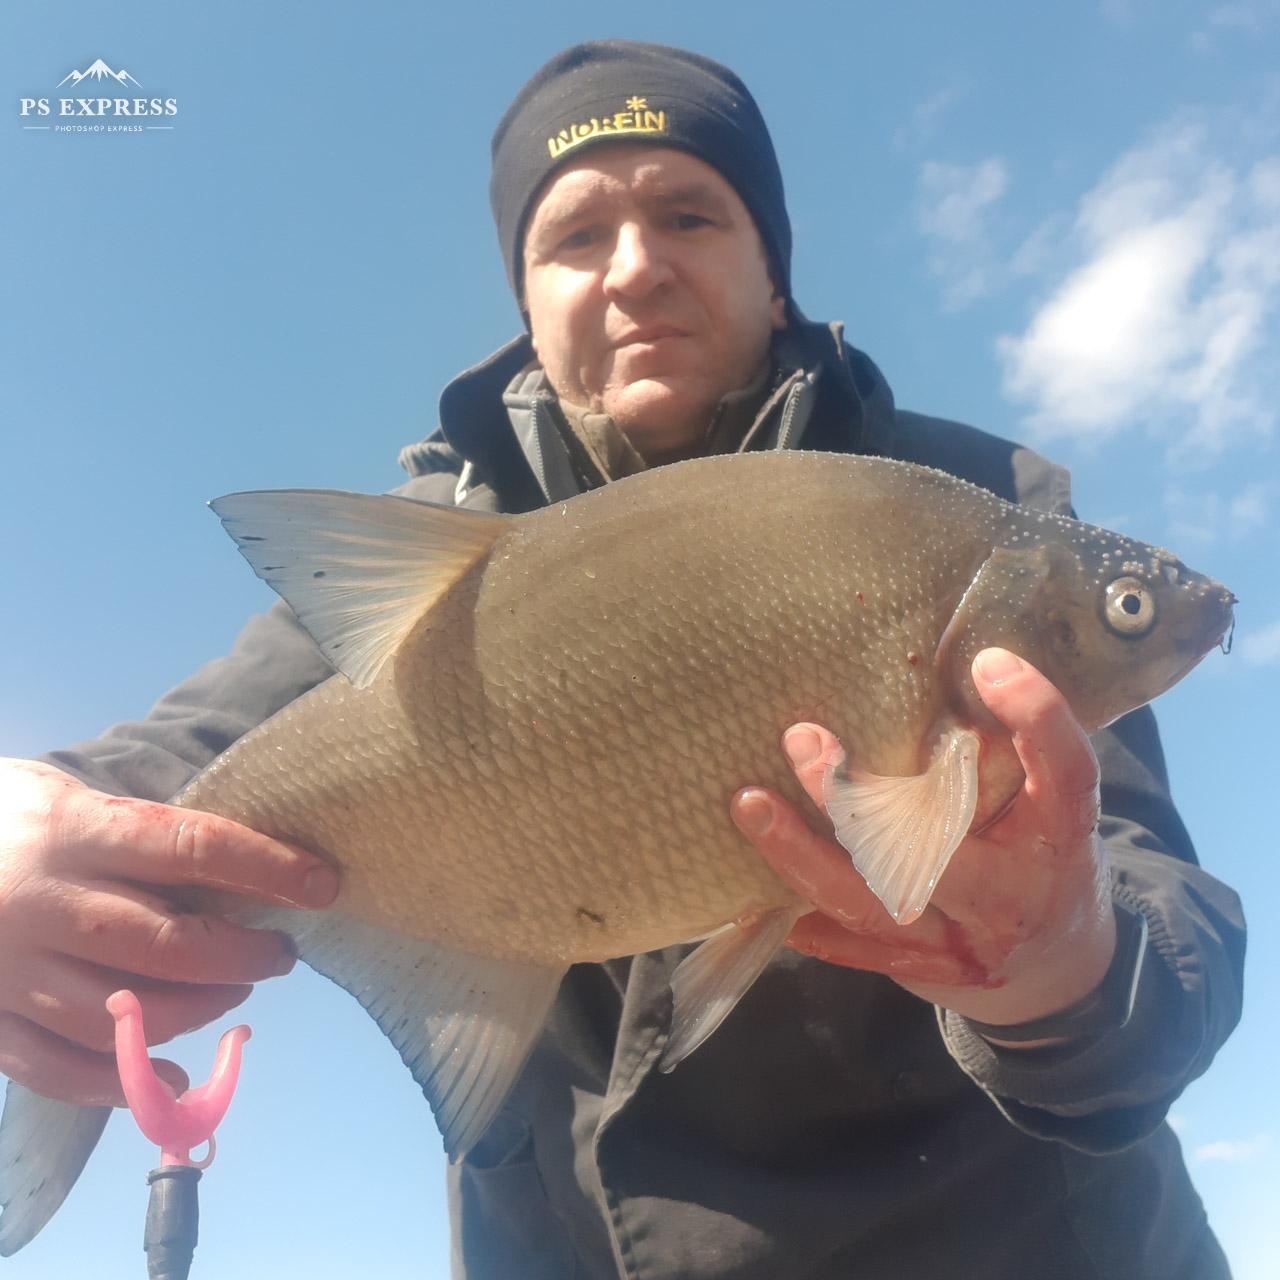 Сегодня попал на раздачу. Приехал в 6-00, холод ... | Отчеты о рыбалке в Беларуси